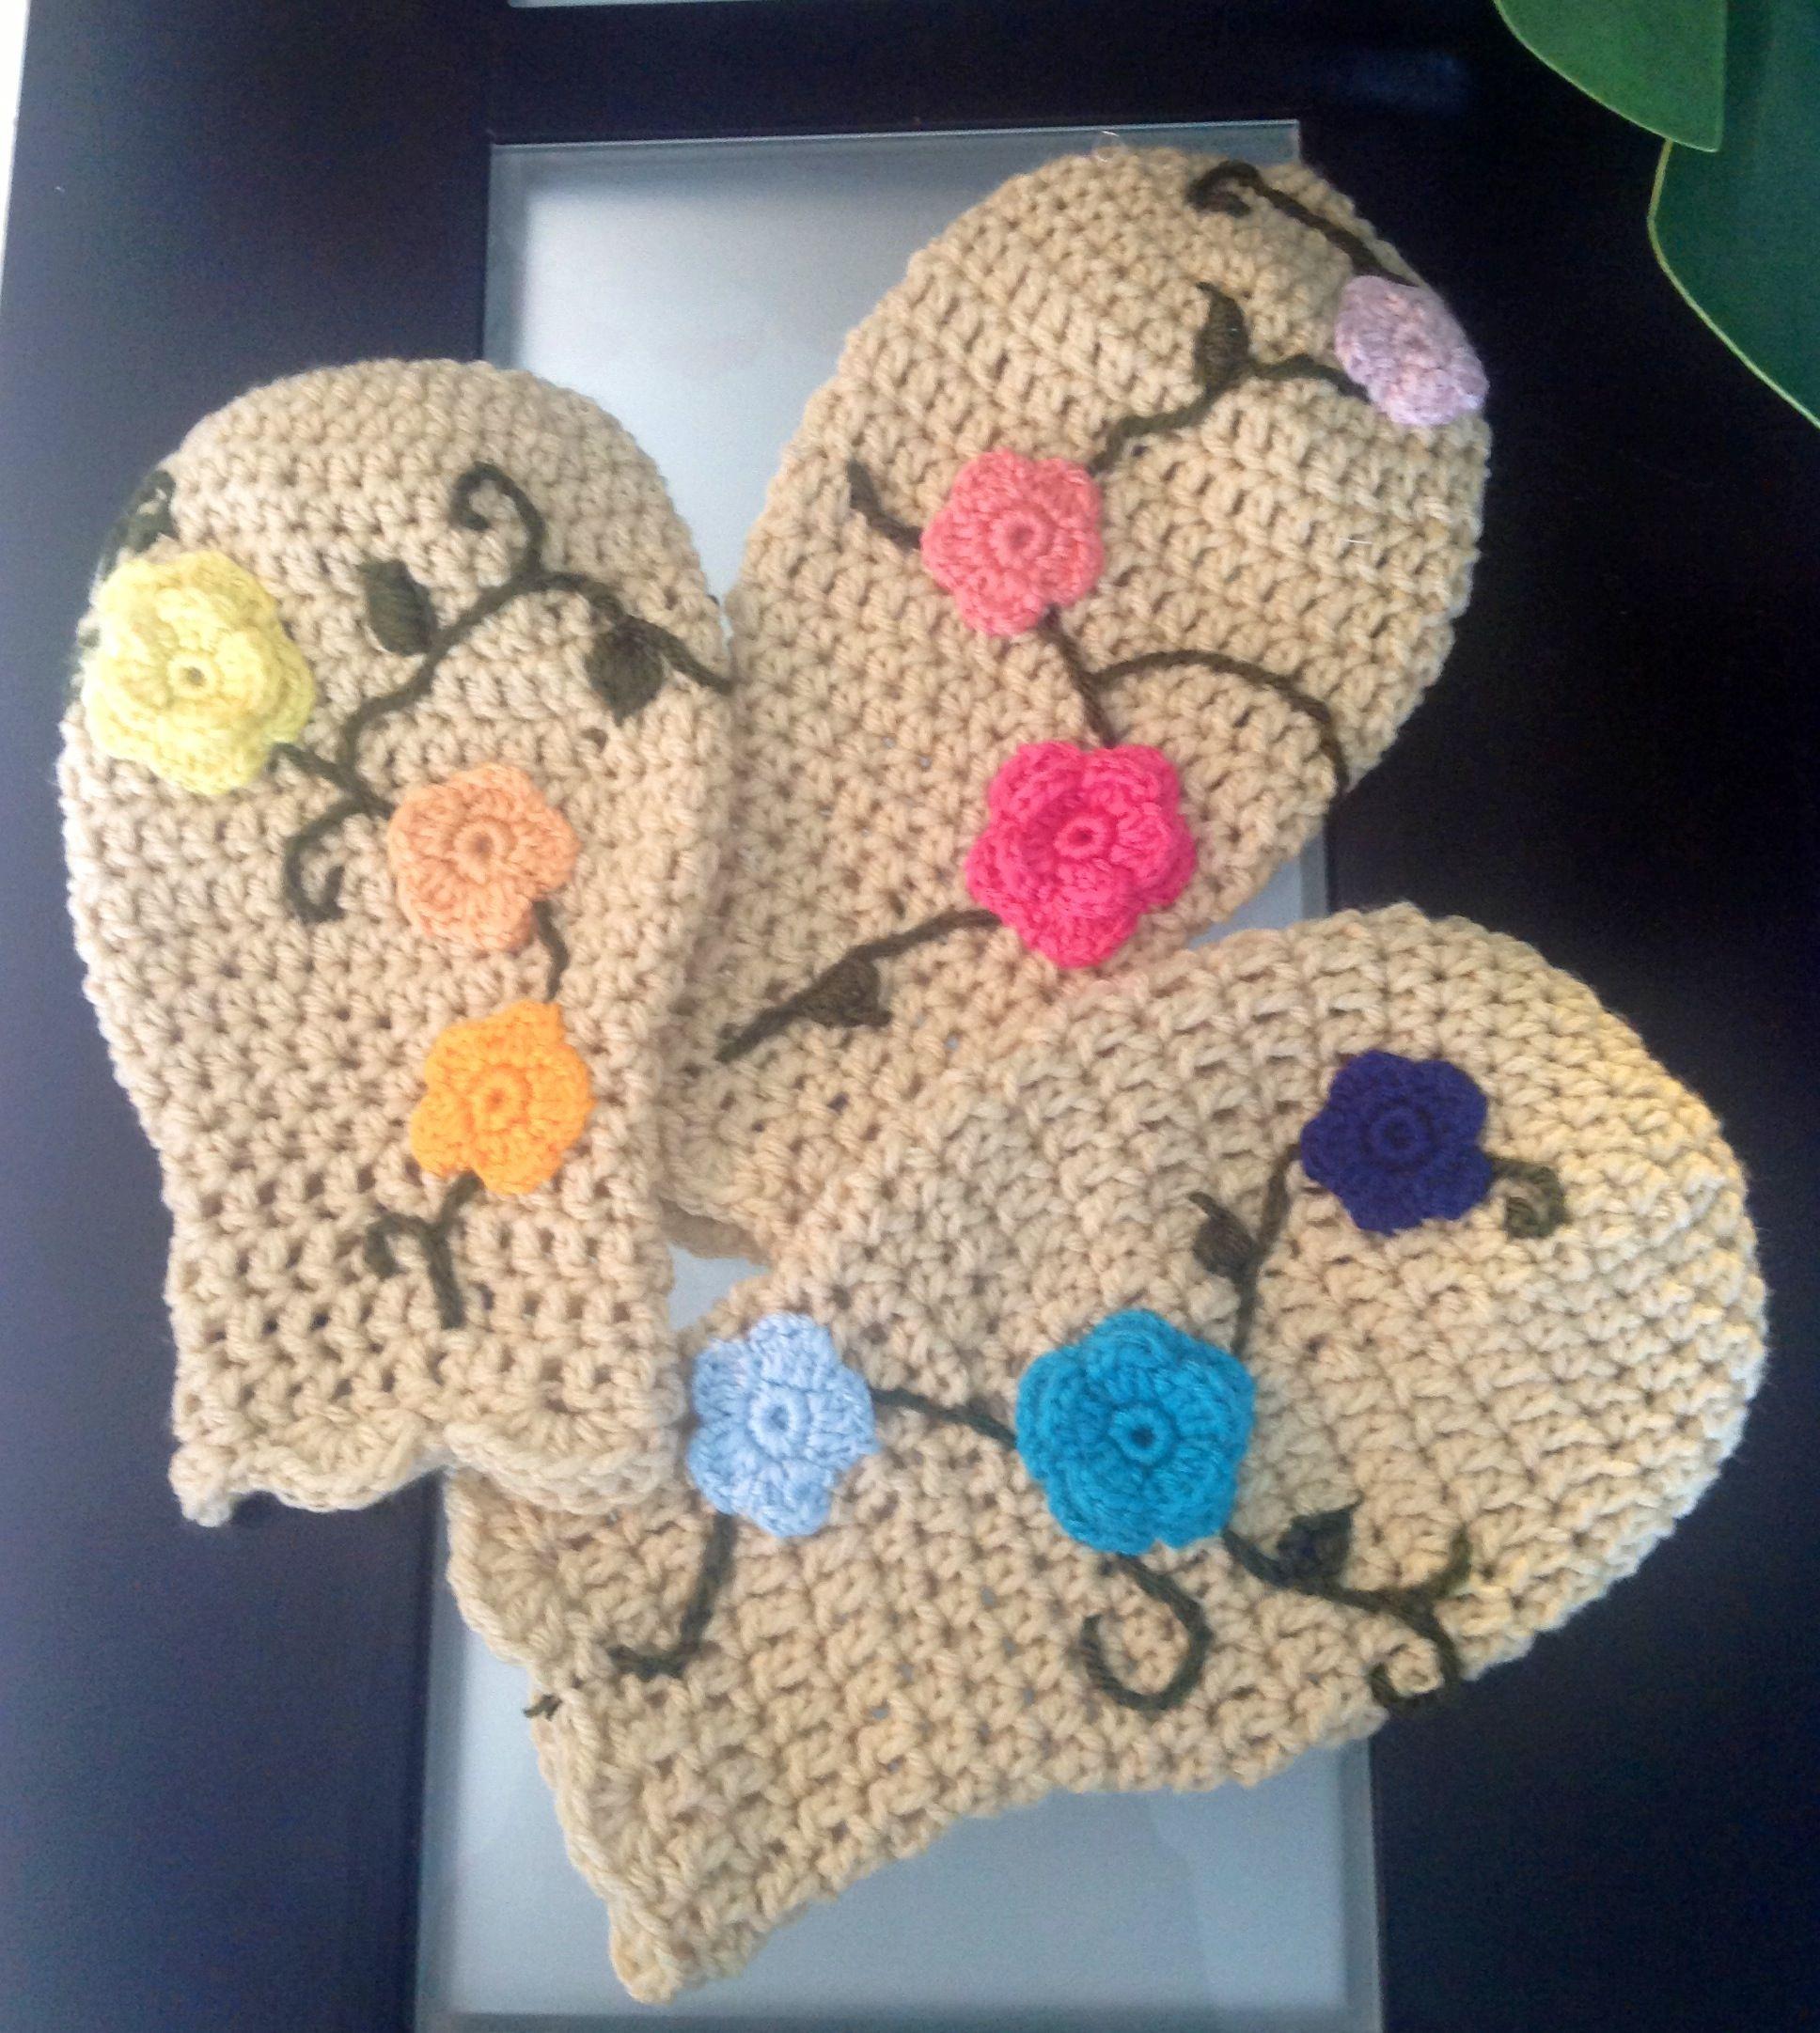 Crochet Golf club covers out of eyelash yarn...no decorations ...